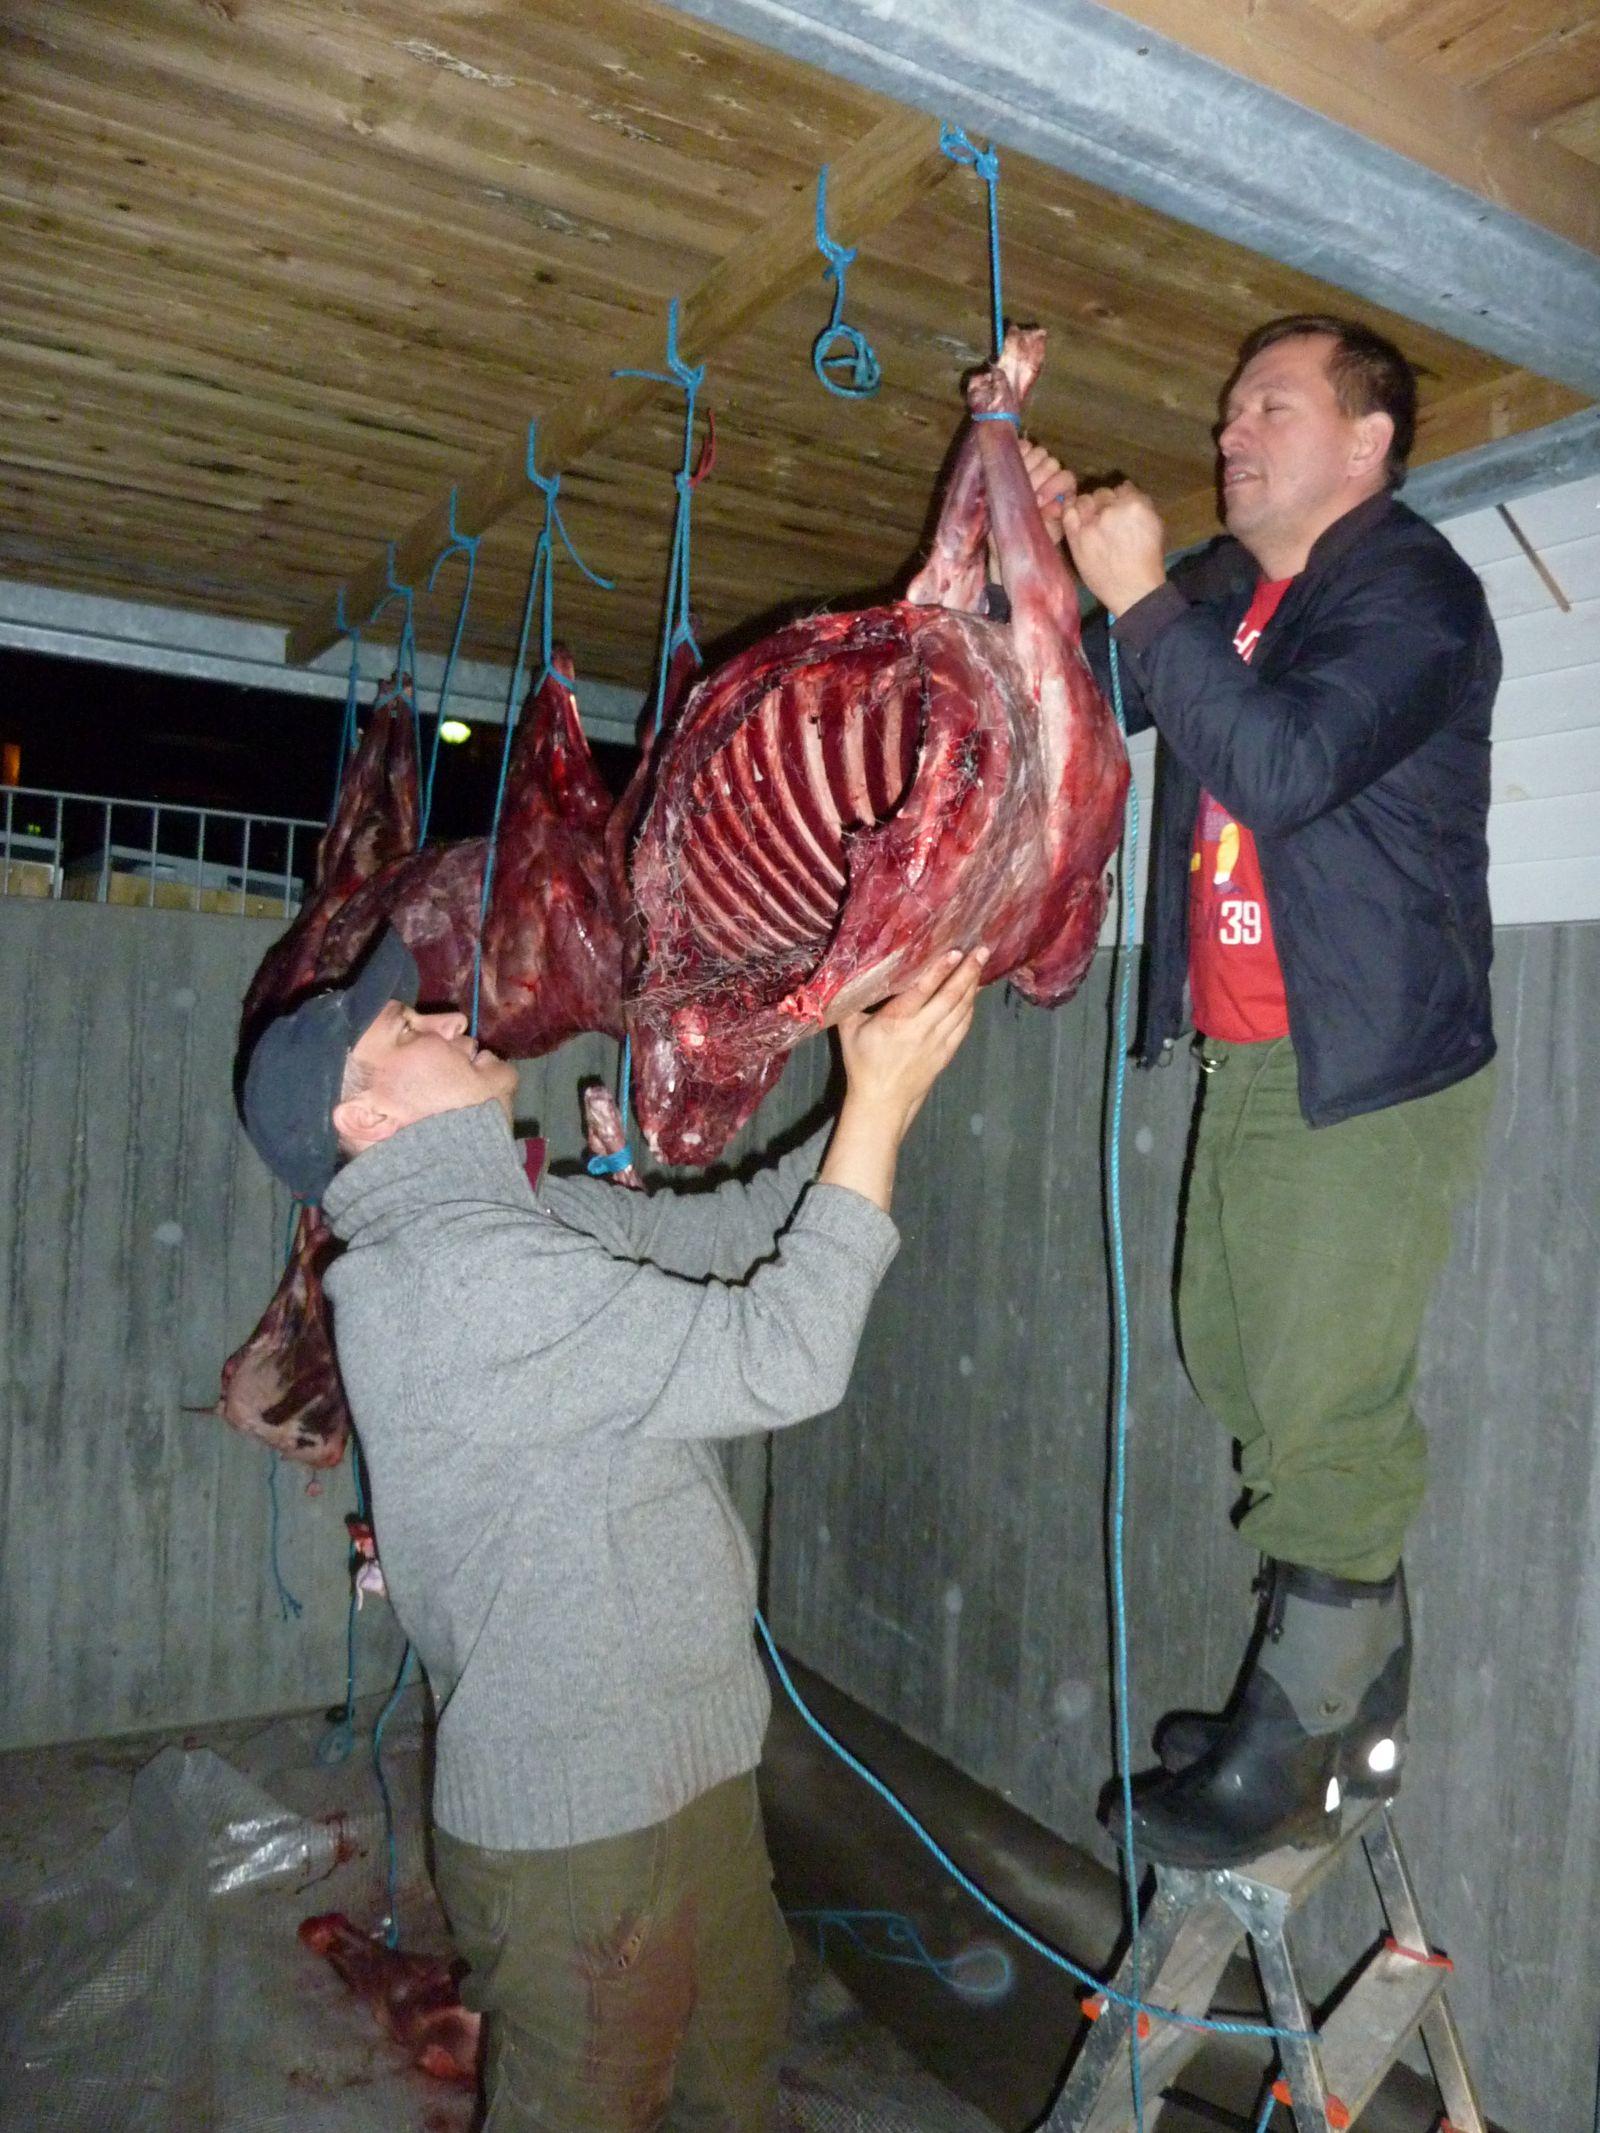 2010-10-19-2000_-_Henrik Steinbacher; Rensdyrkød; Svend Sværd